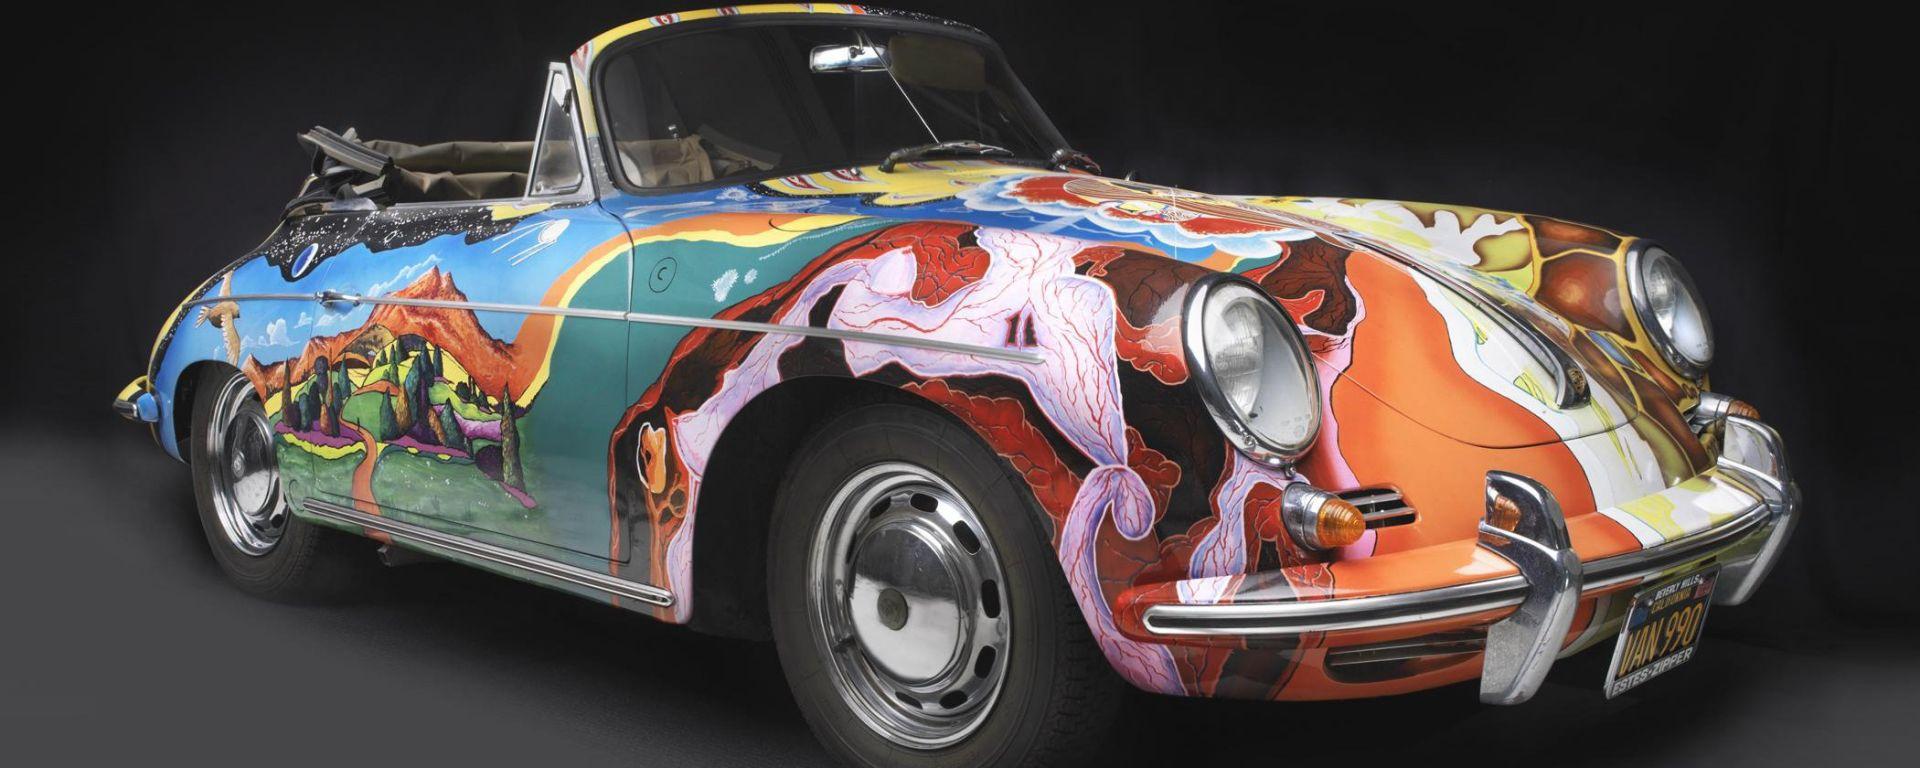 La Porsche di Janis Joplin battuta all'asta